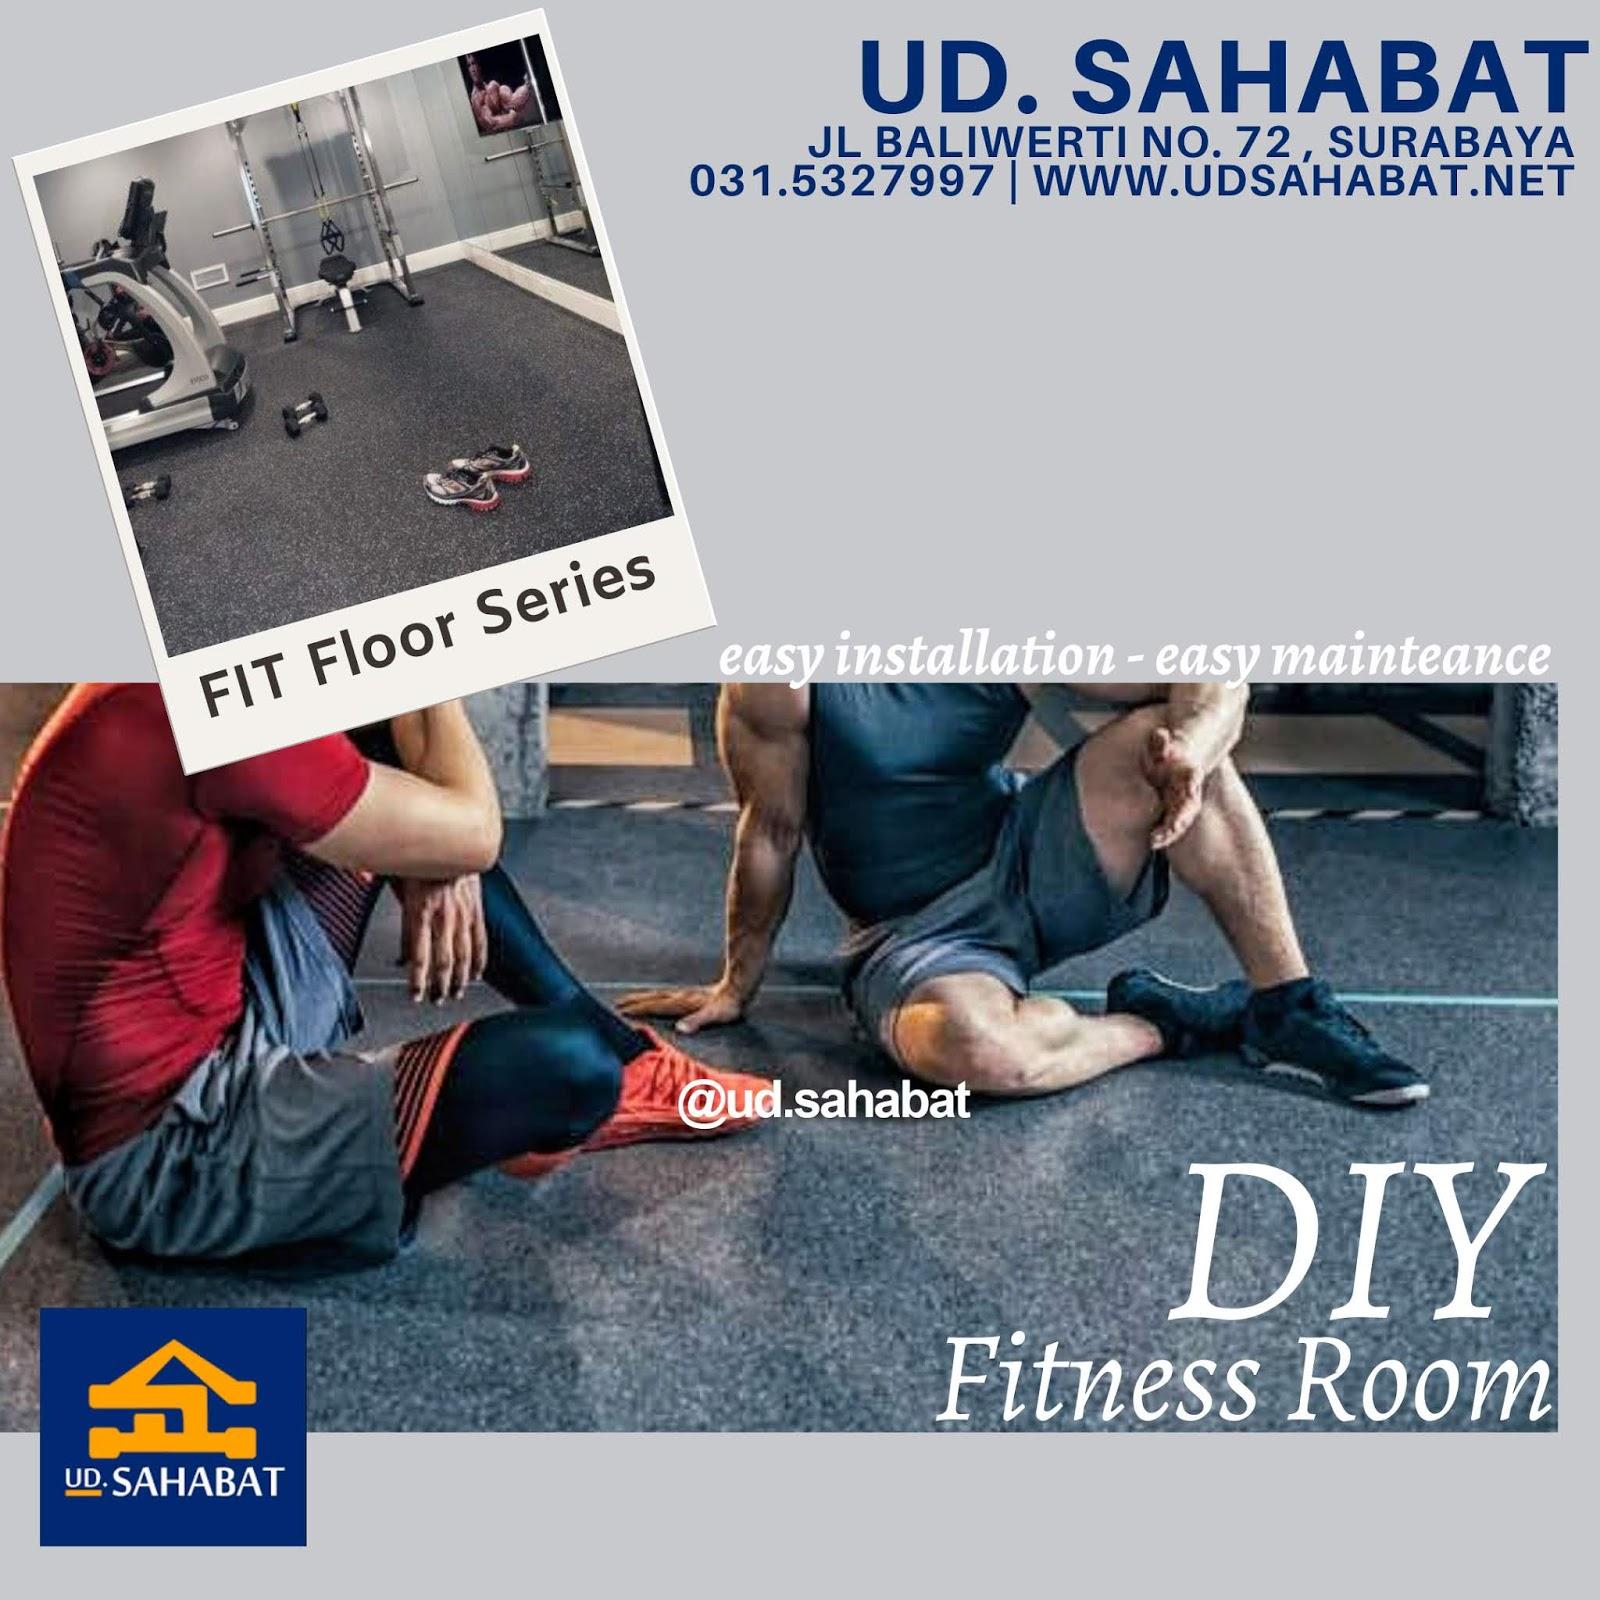 jual lantai ruang fitness gym ud sahabat baliwerti surabaya